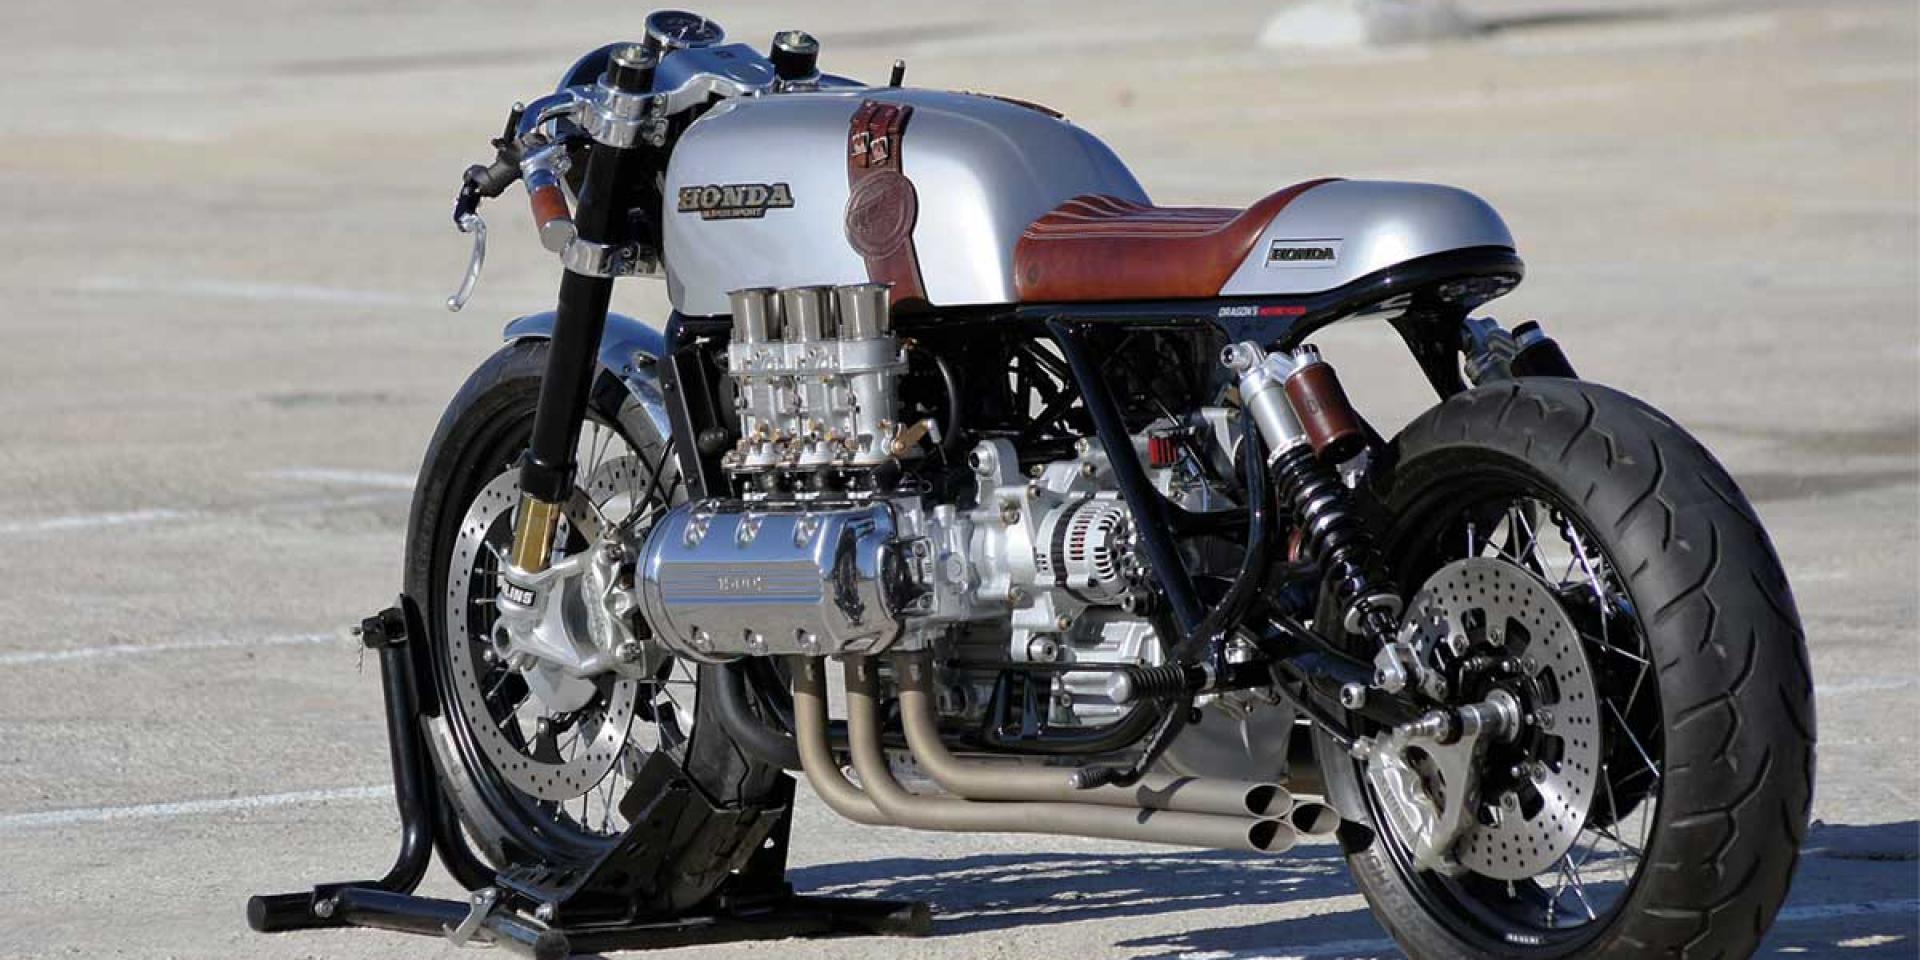 特大杯六缸咖啡。HONDA「GOLDWING Cafe Racer」by.Dragon's Motorcycles